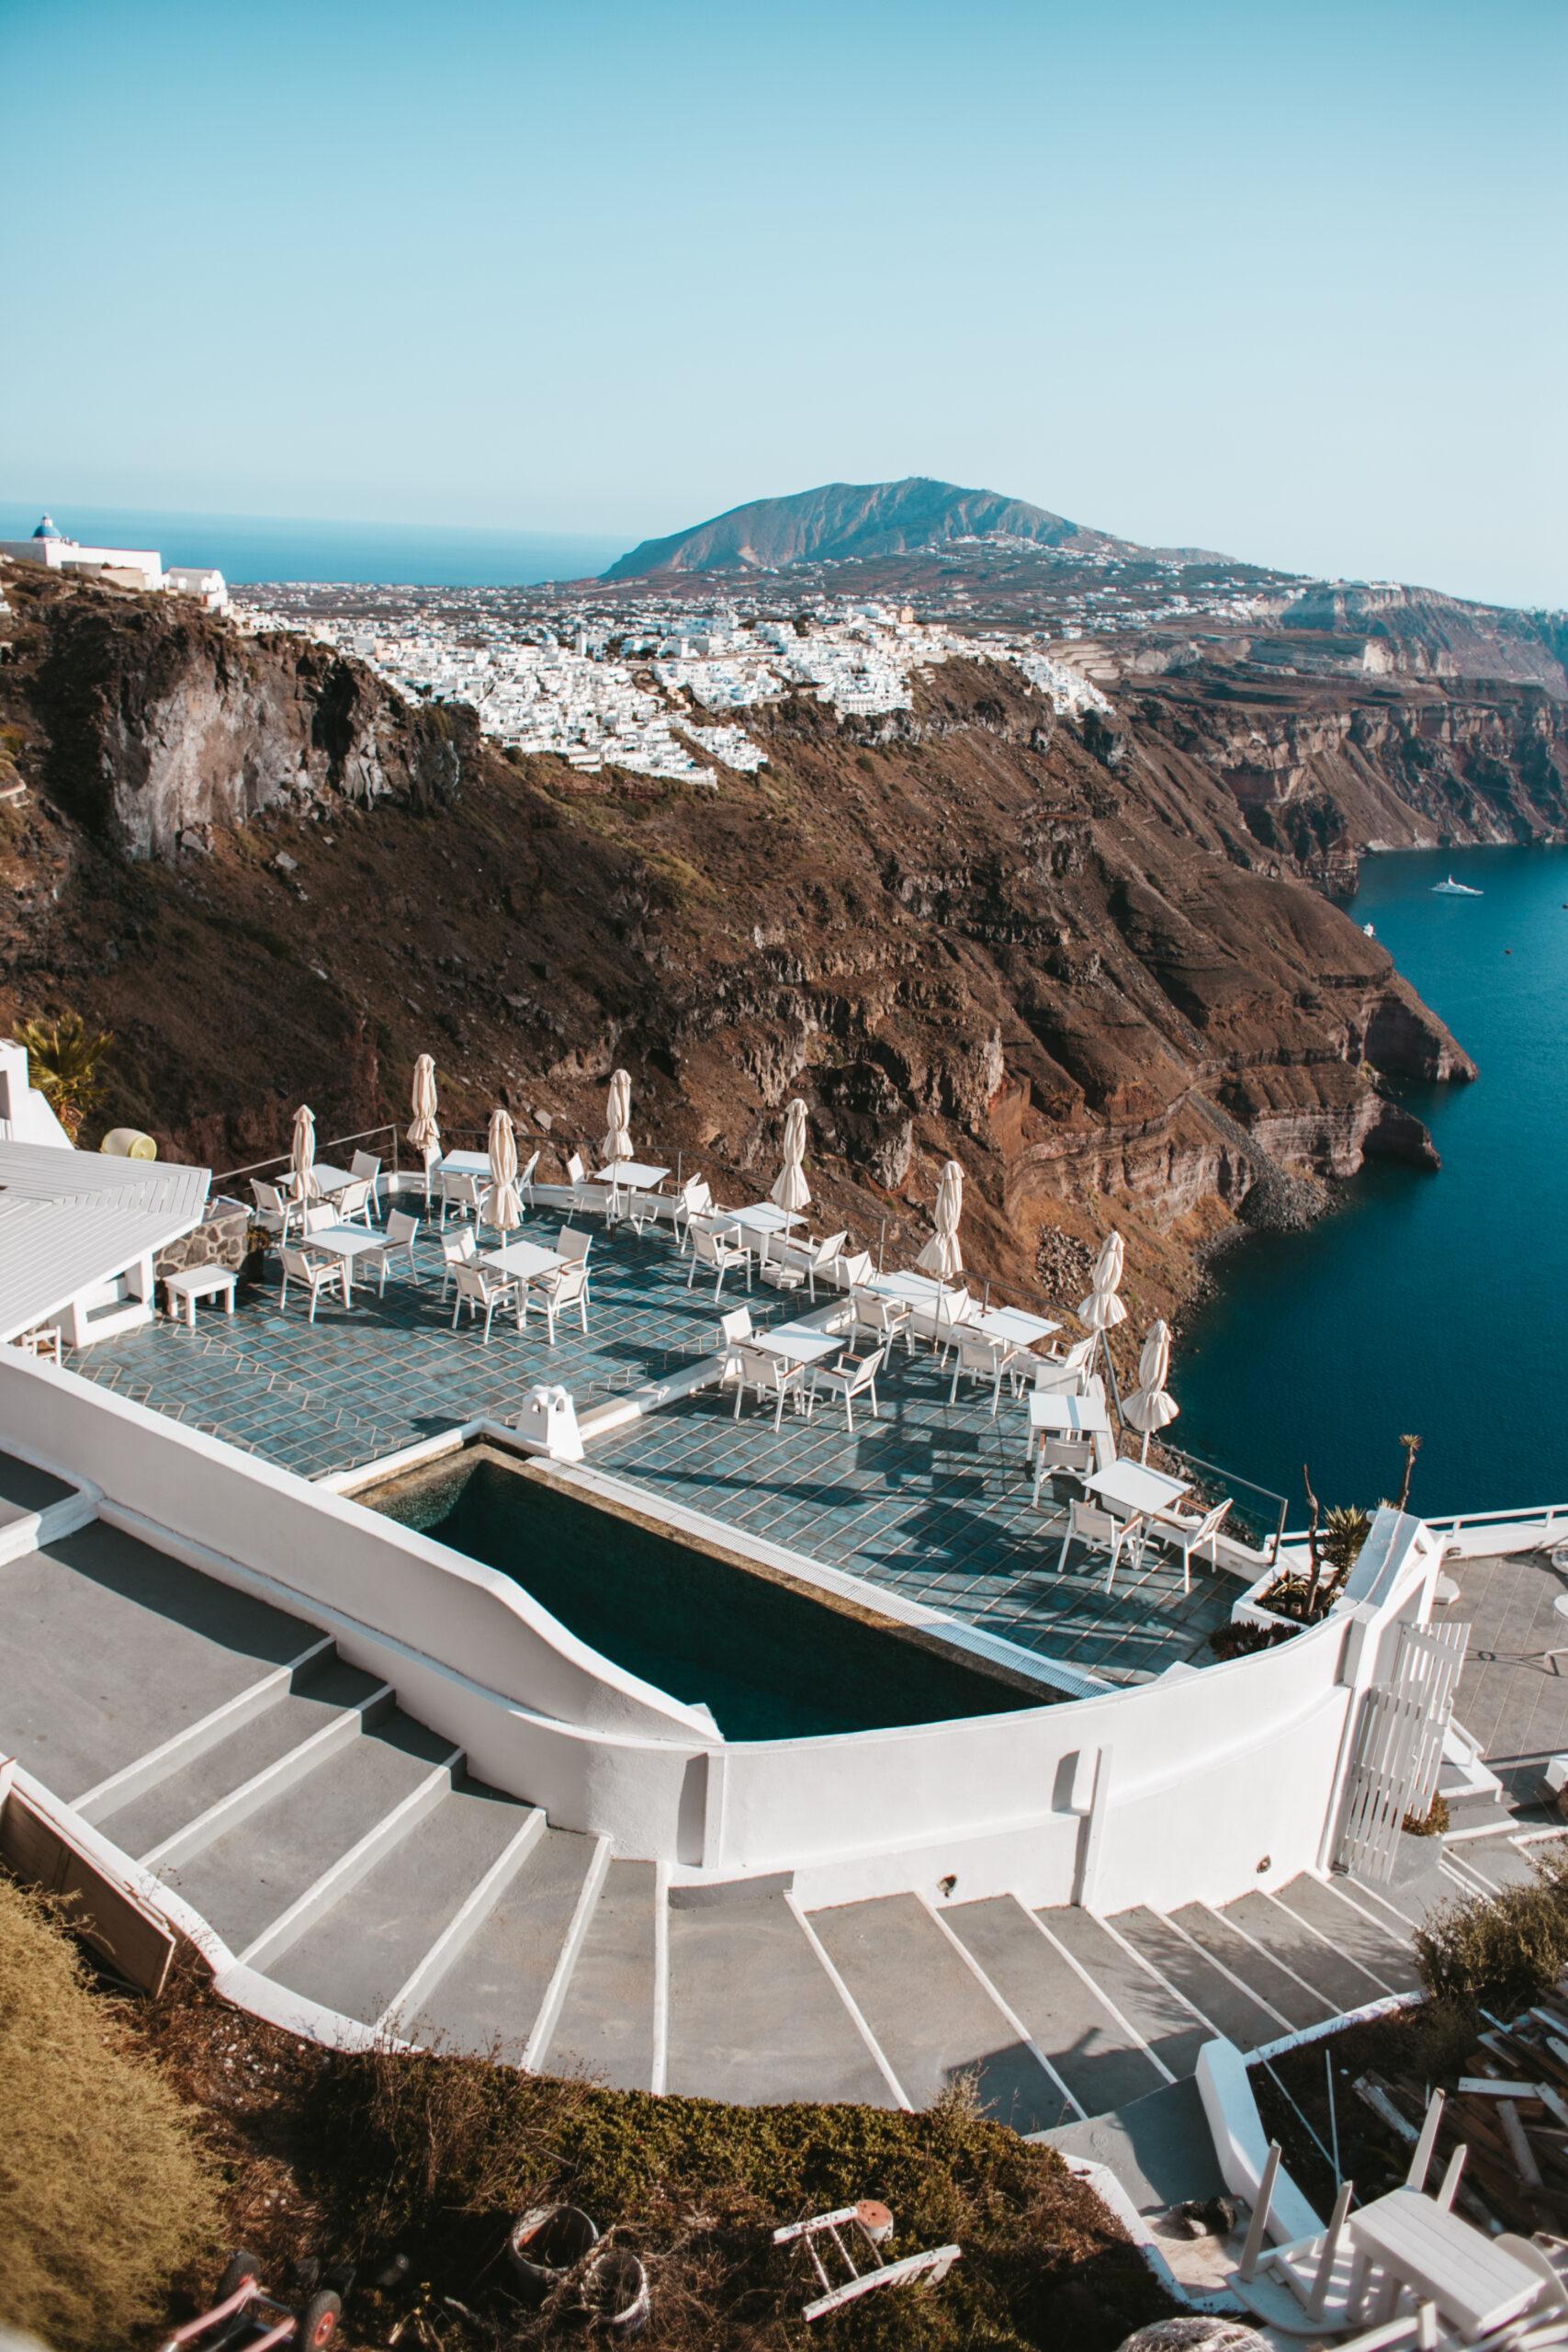 Widok na kalderę z Imerovigli Santorini, kaldera, białe domki na klifie i restauracja Santorini